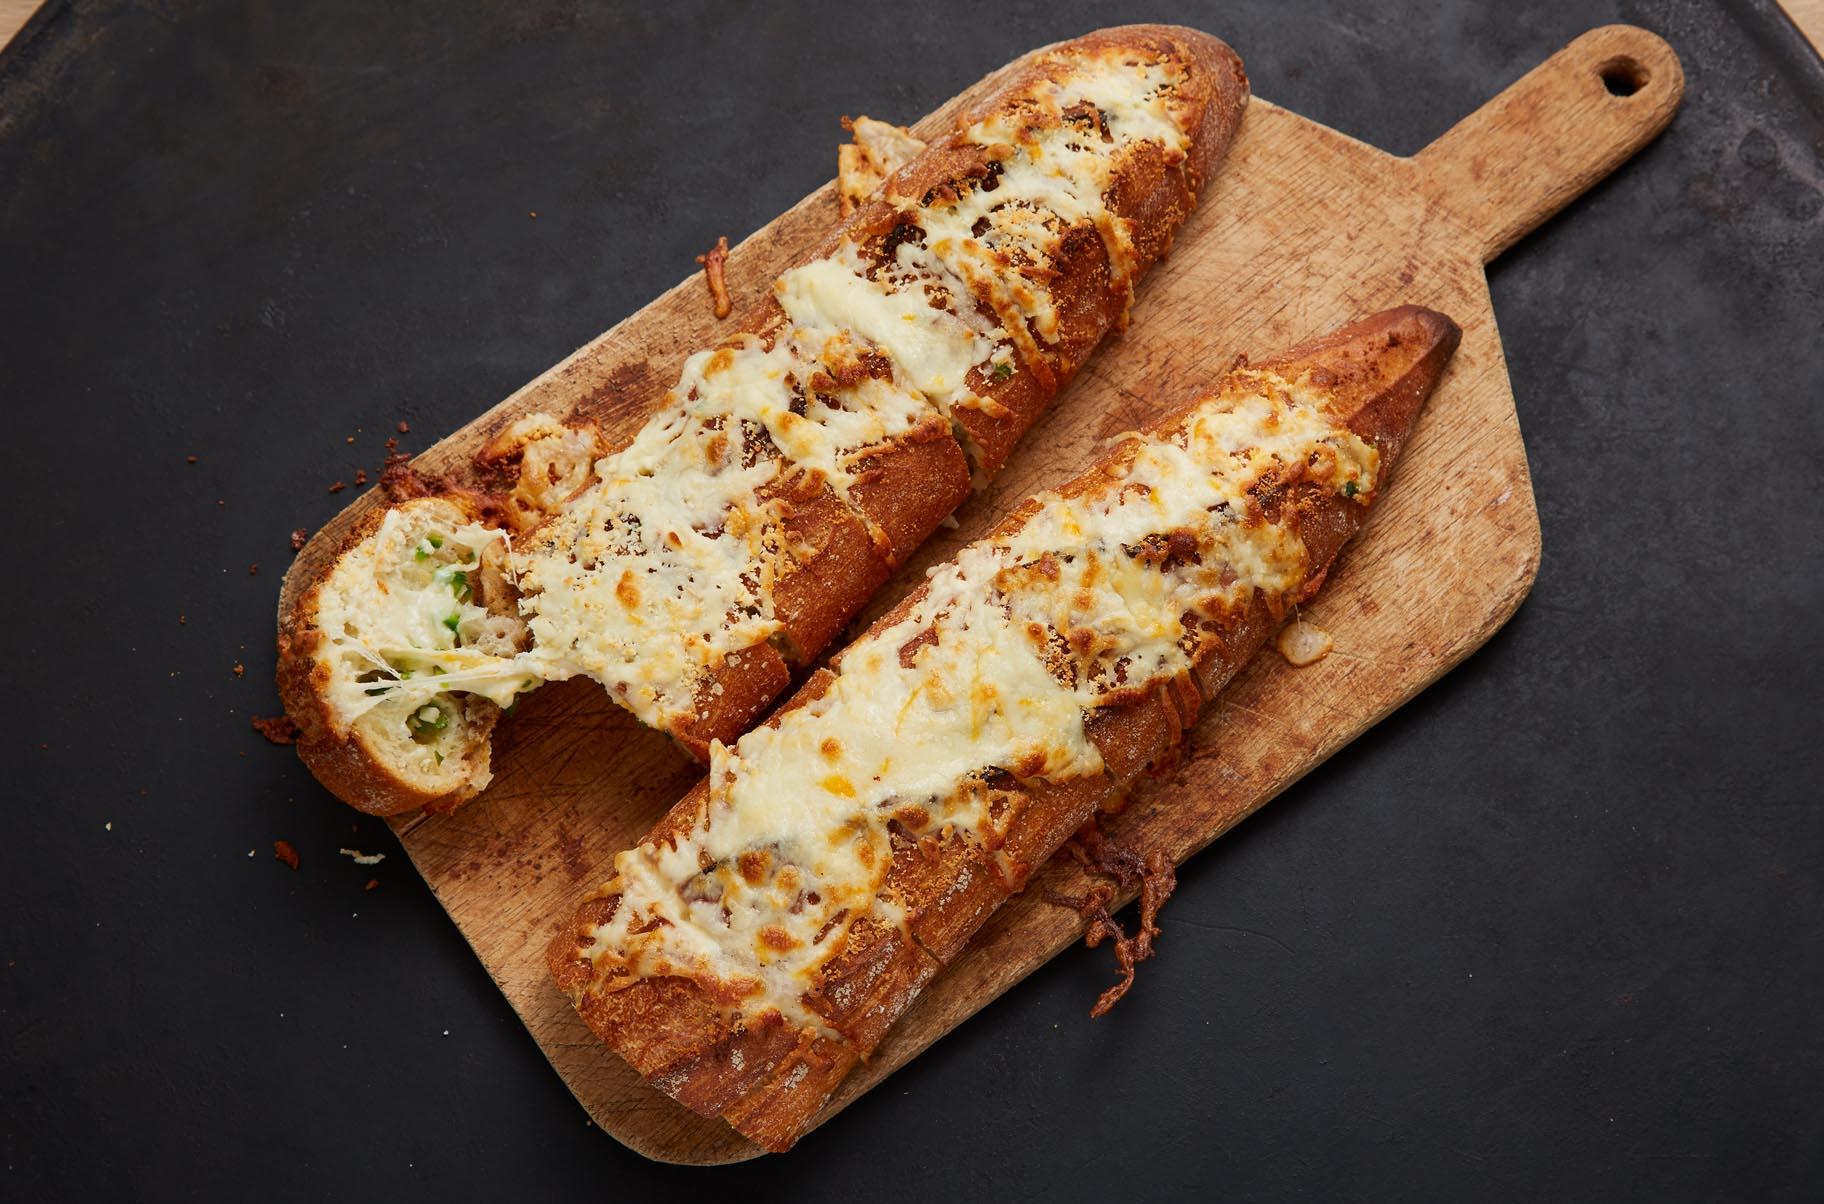 Jalapeño and Garlic Cheesy Bread